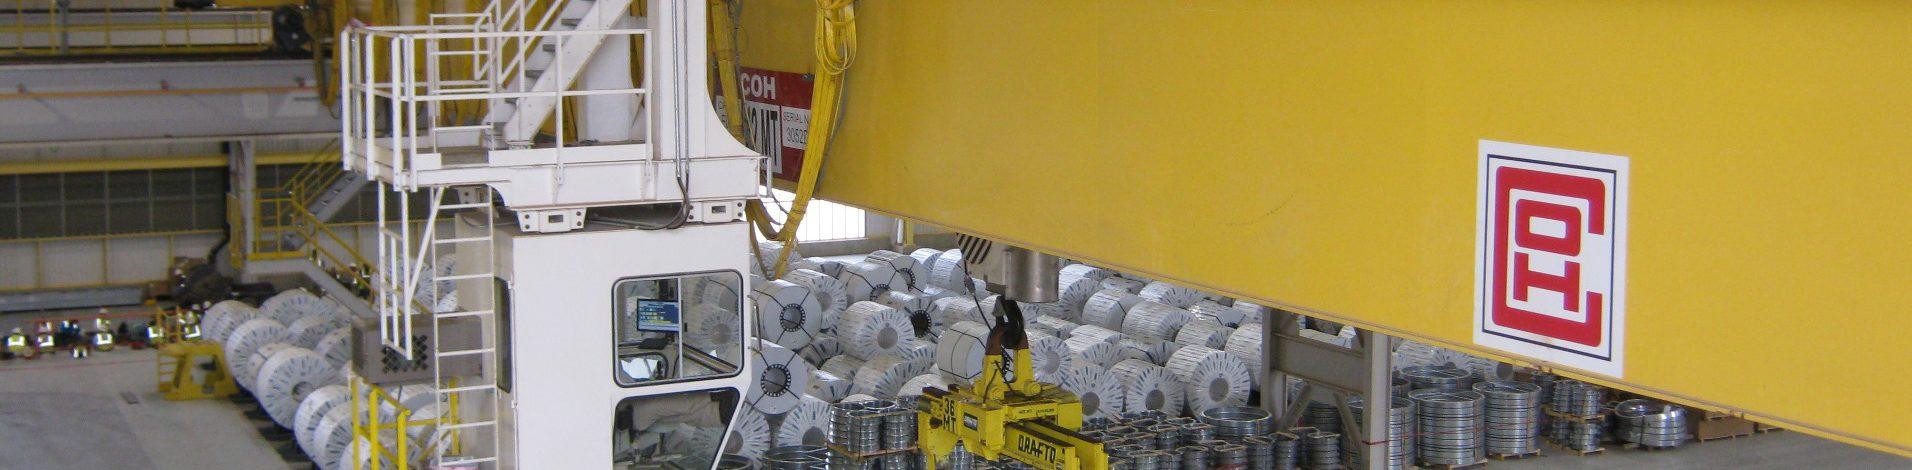 coil-handling-overhead-crane